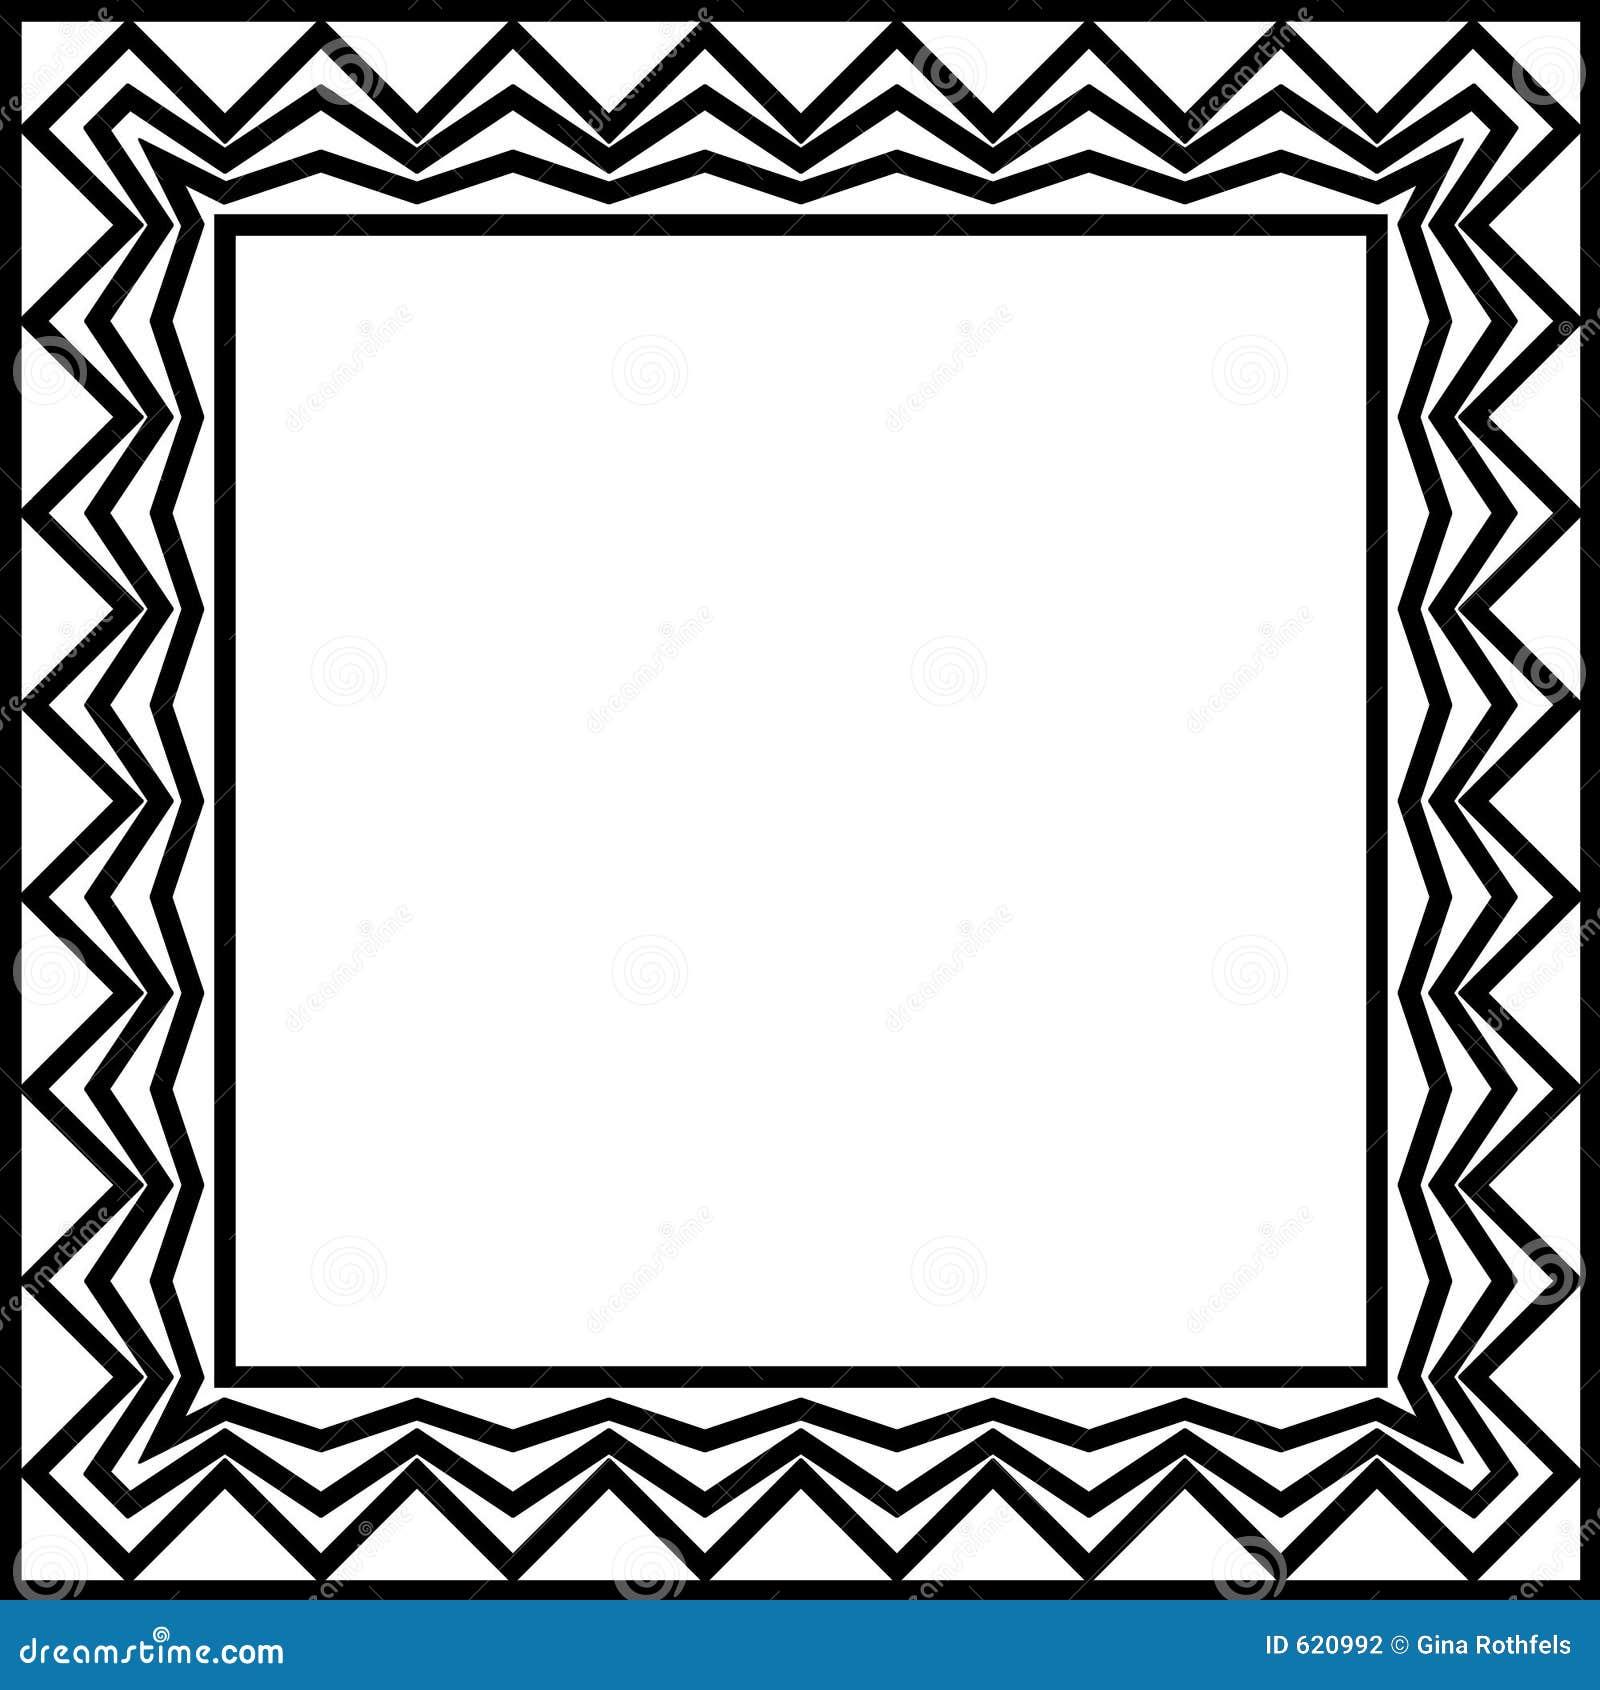 geometric border stock photography